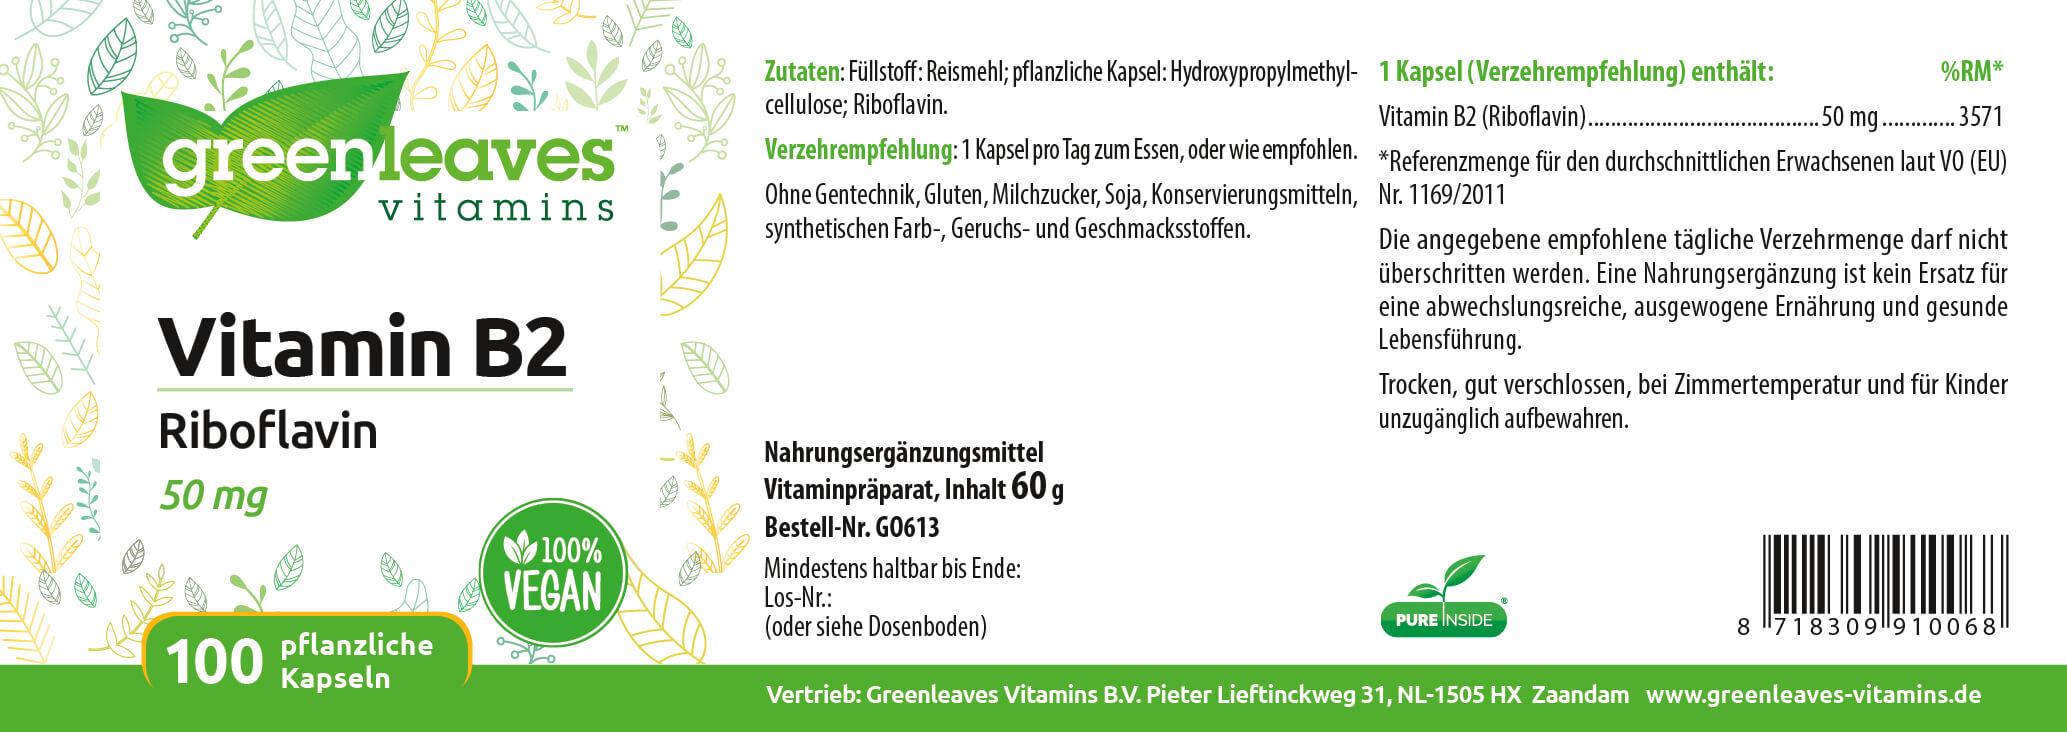 GO613-Vitamin-B2-50-mg0meUVpynyIN03